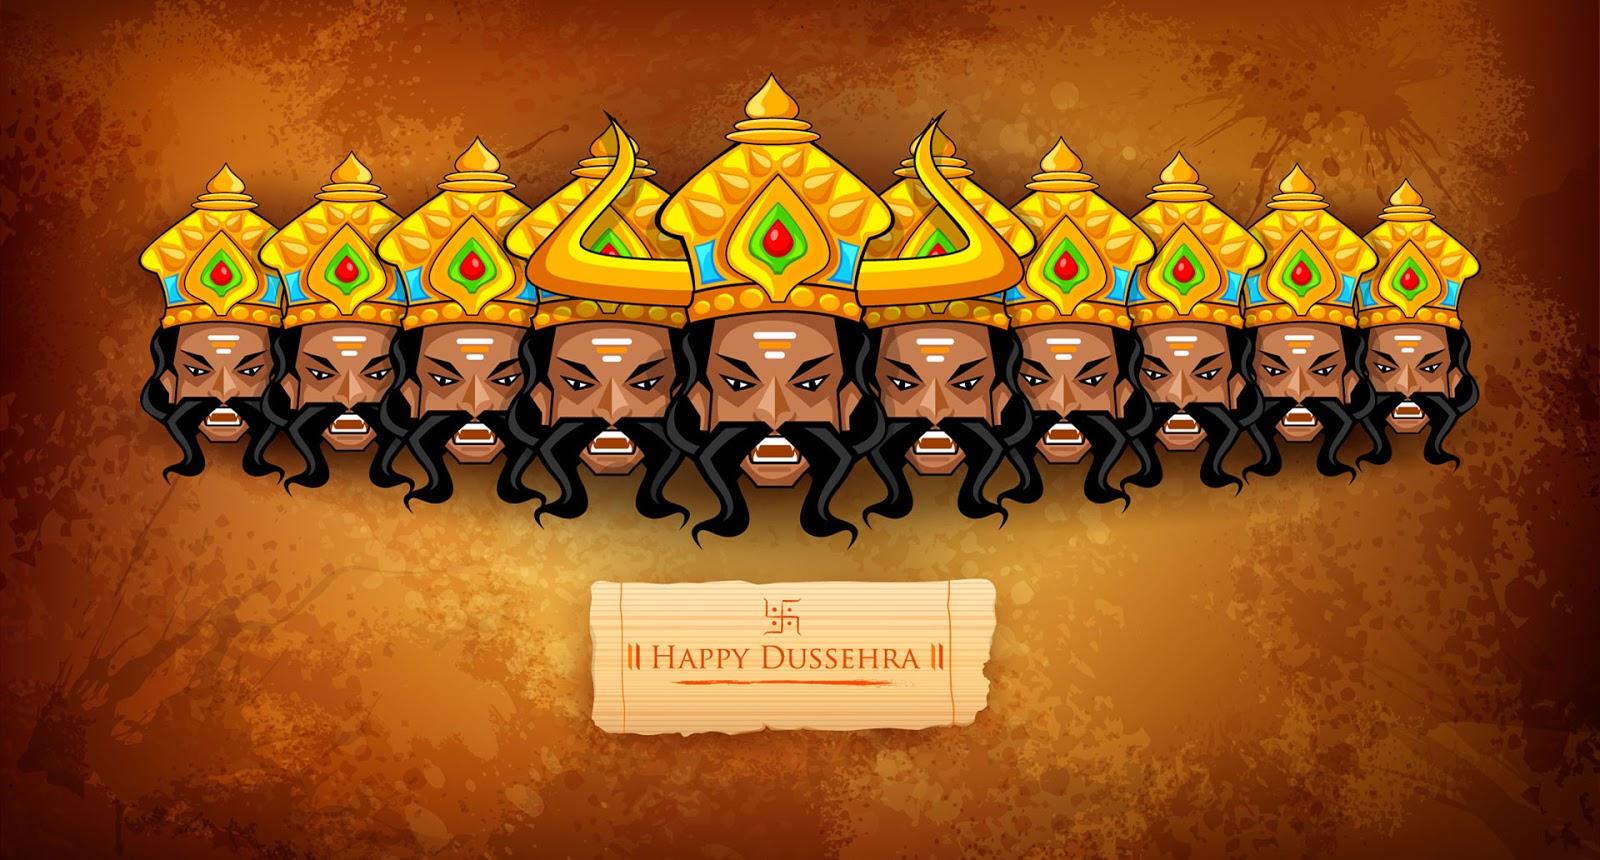 Happy vijaya dashami 2017 wishes images happ dussehra facebook happy vijaya dashami 2017 wishes images happ dussehra facebook messages whatsapp greetings and texts kristyandbryce Choice Image